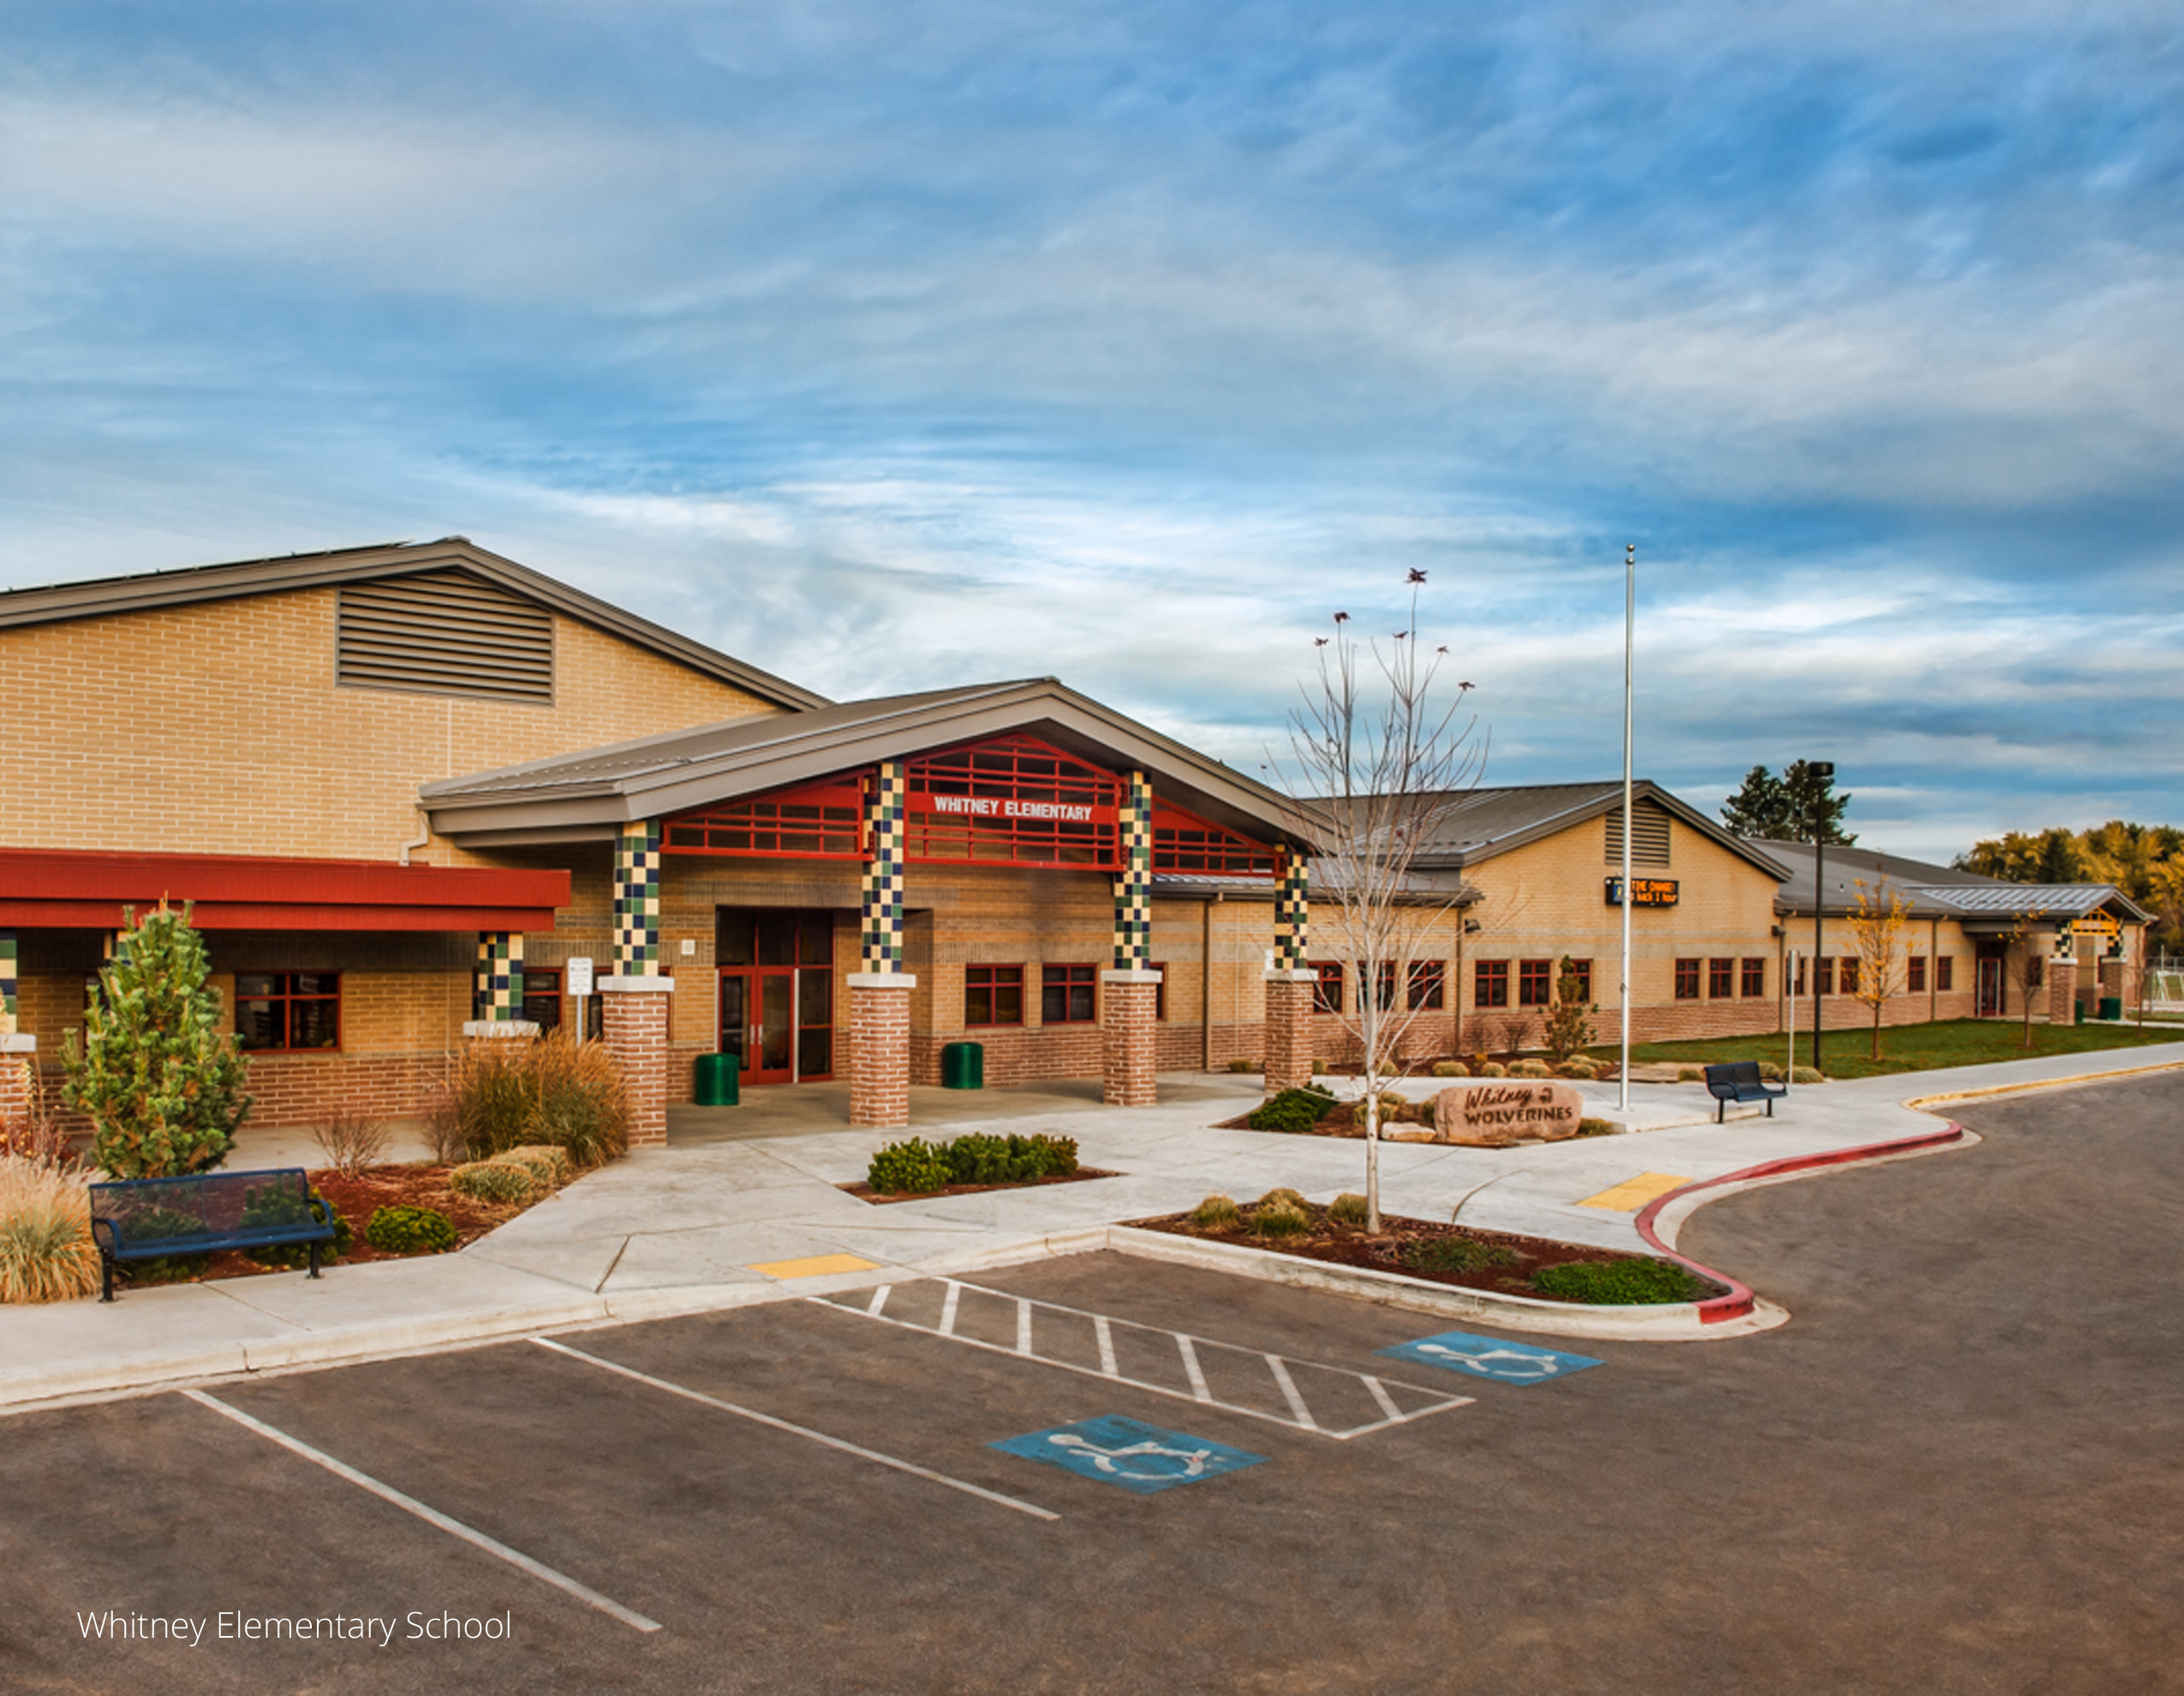 Whitney Elementary